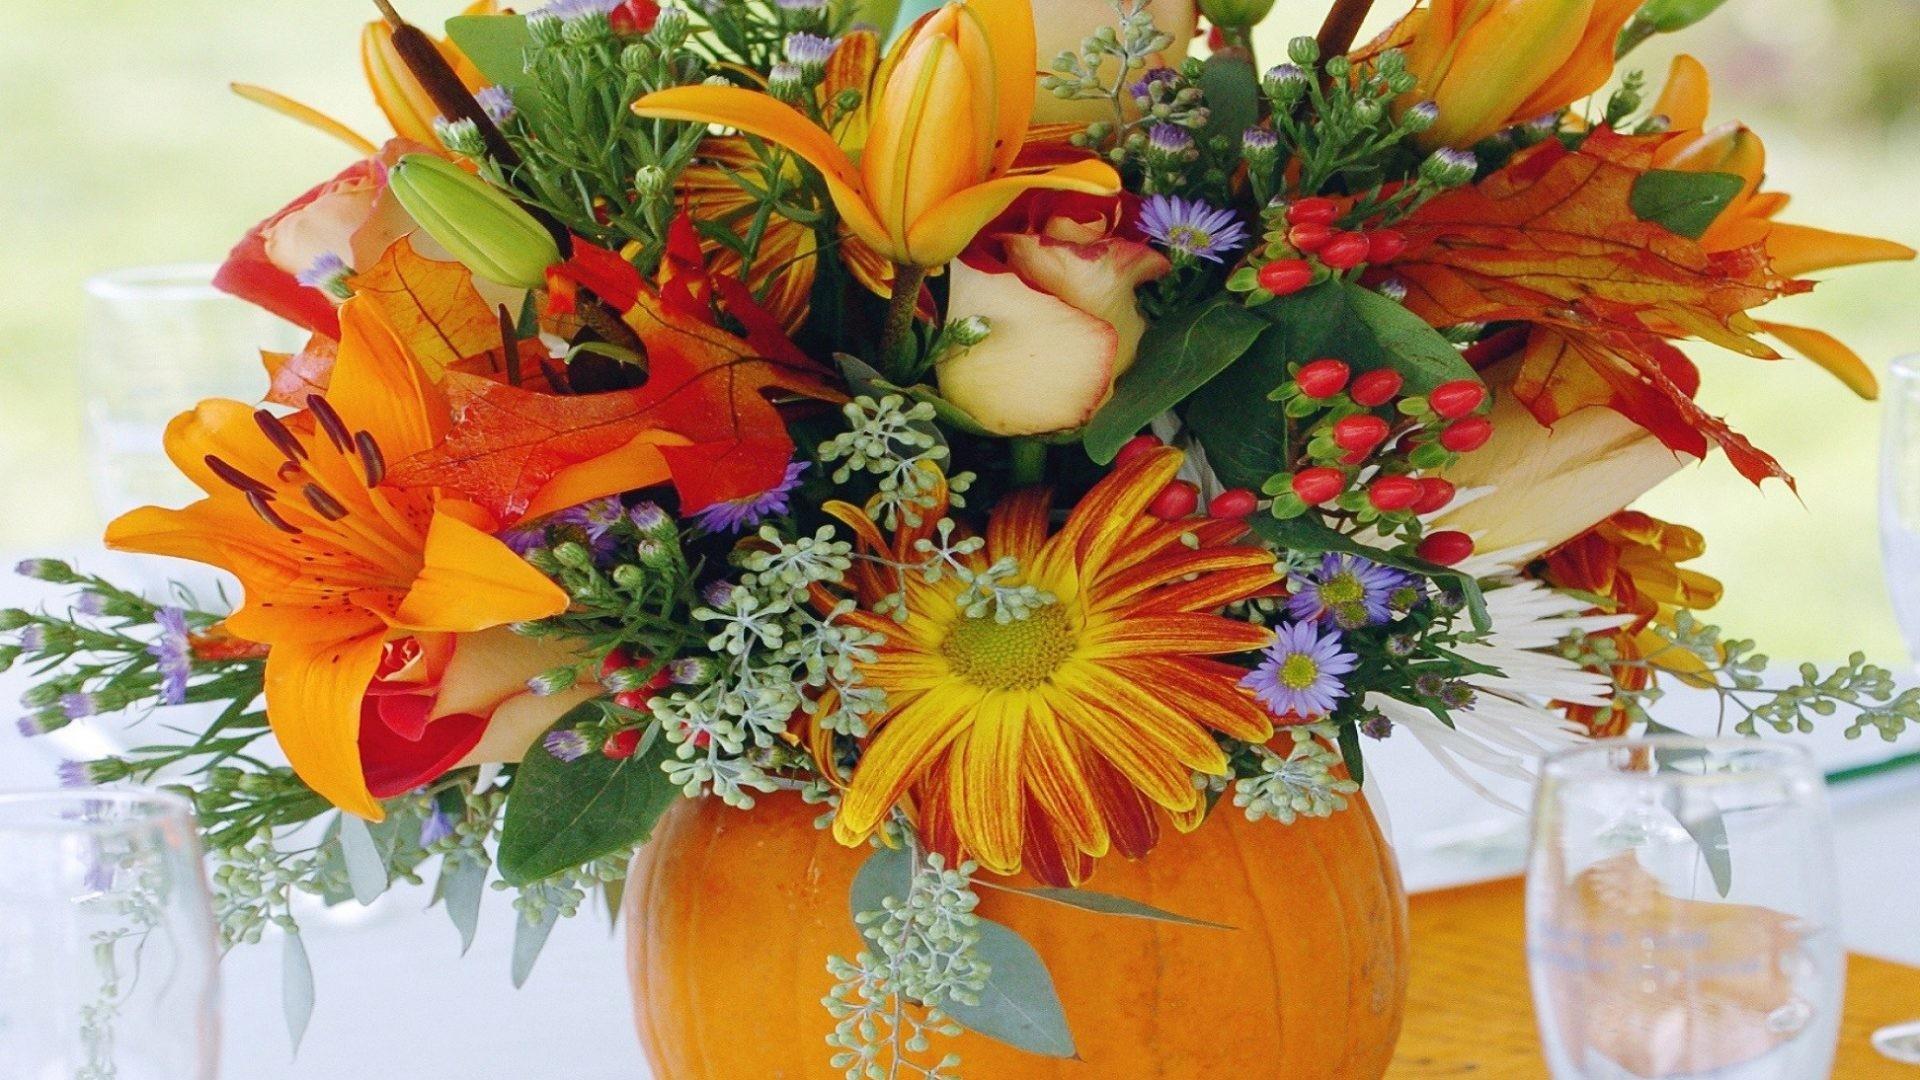 Pumpkin Tag – Leaves Thanksgiving Lillies Seasonal Orange Glass Autumn  Roses Harvest Sunflowers Wineglass Pumpkin Blooms